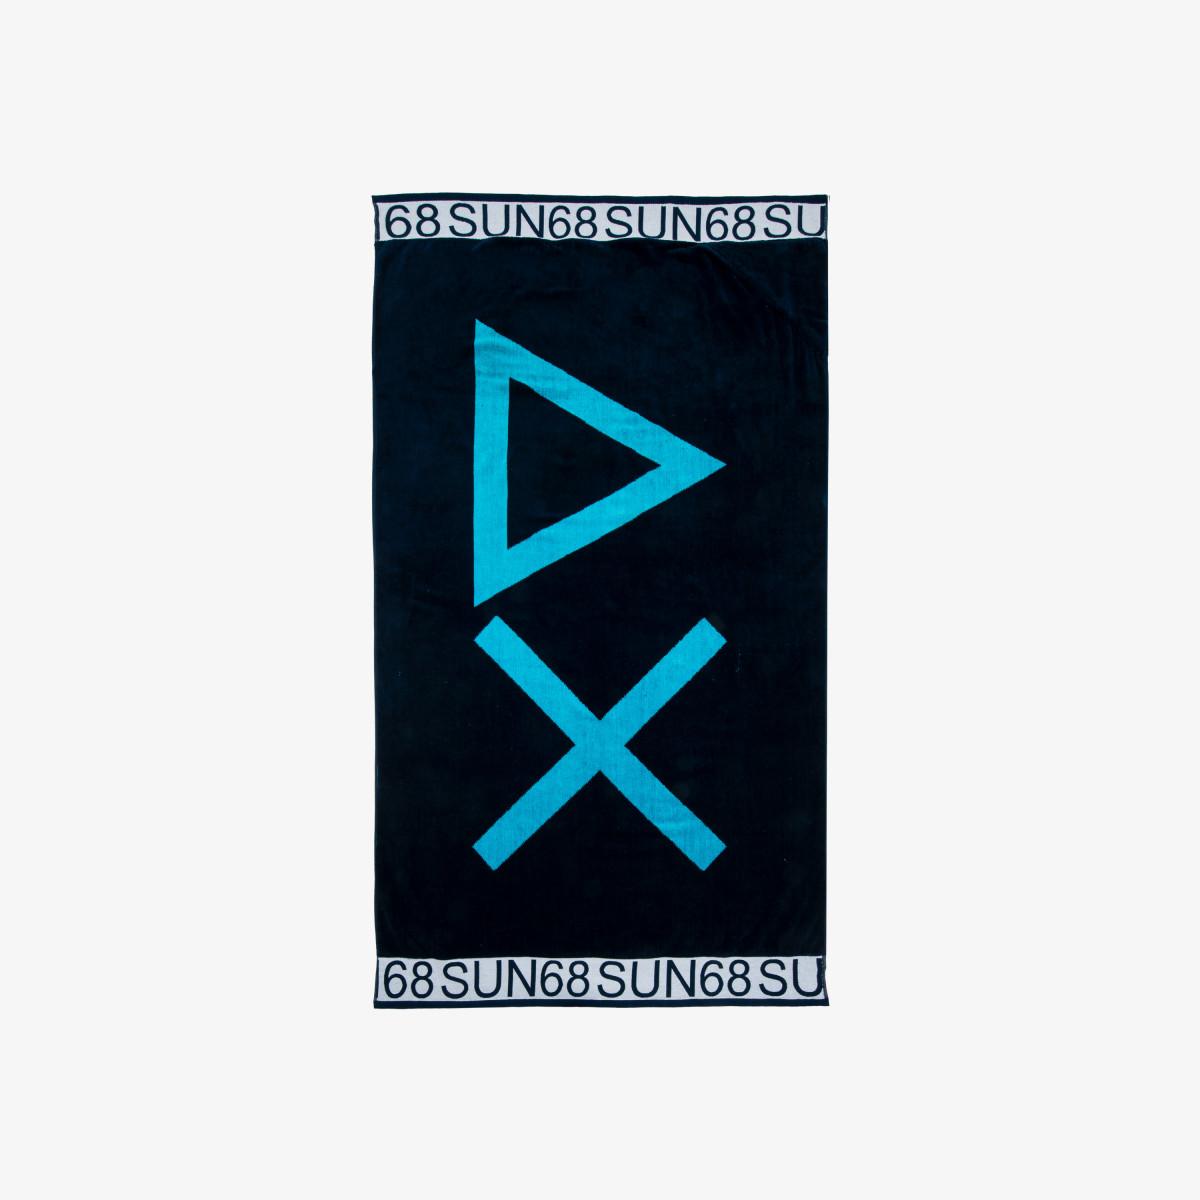 X19111_0713.jpg